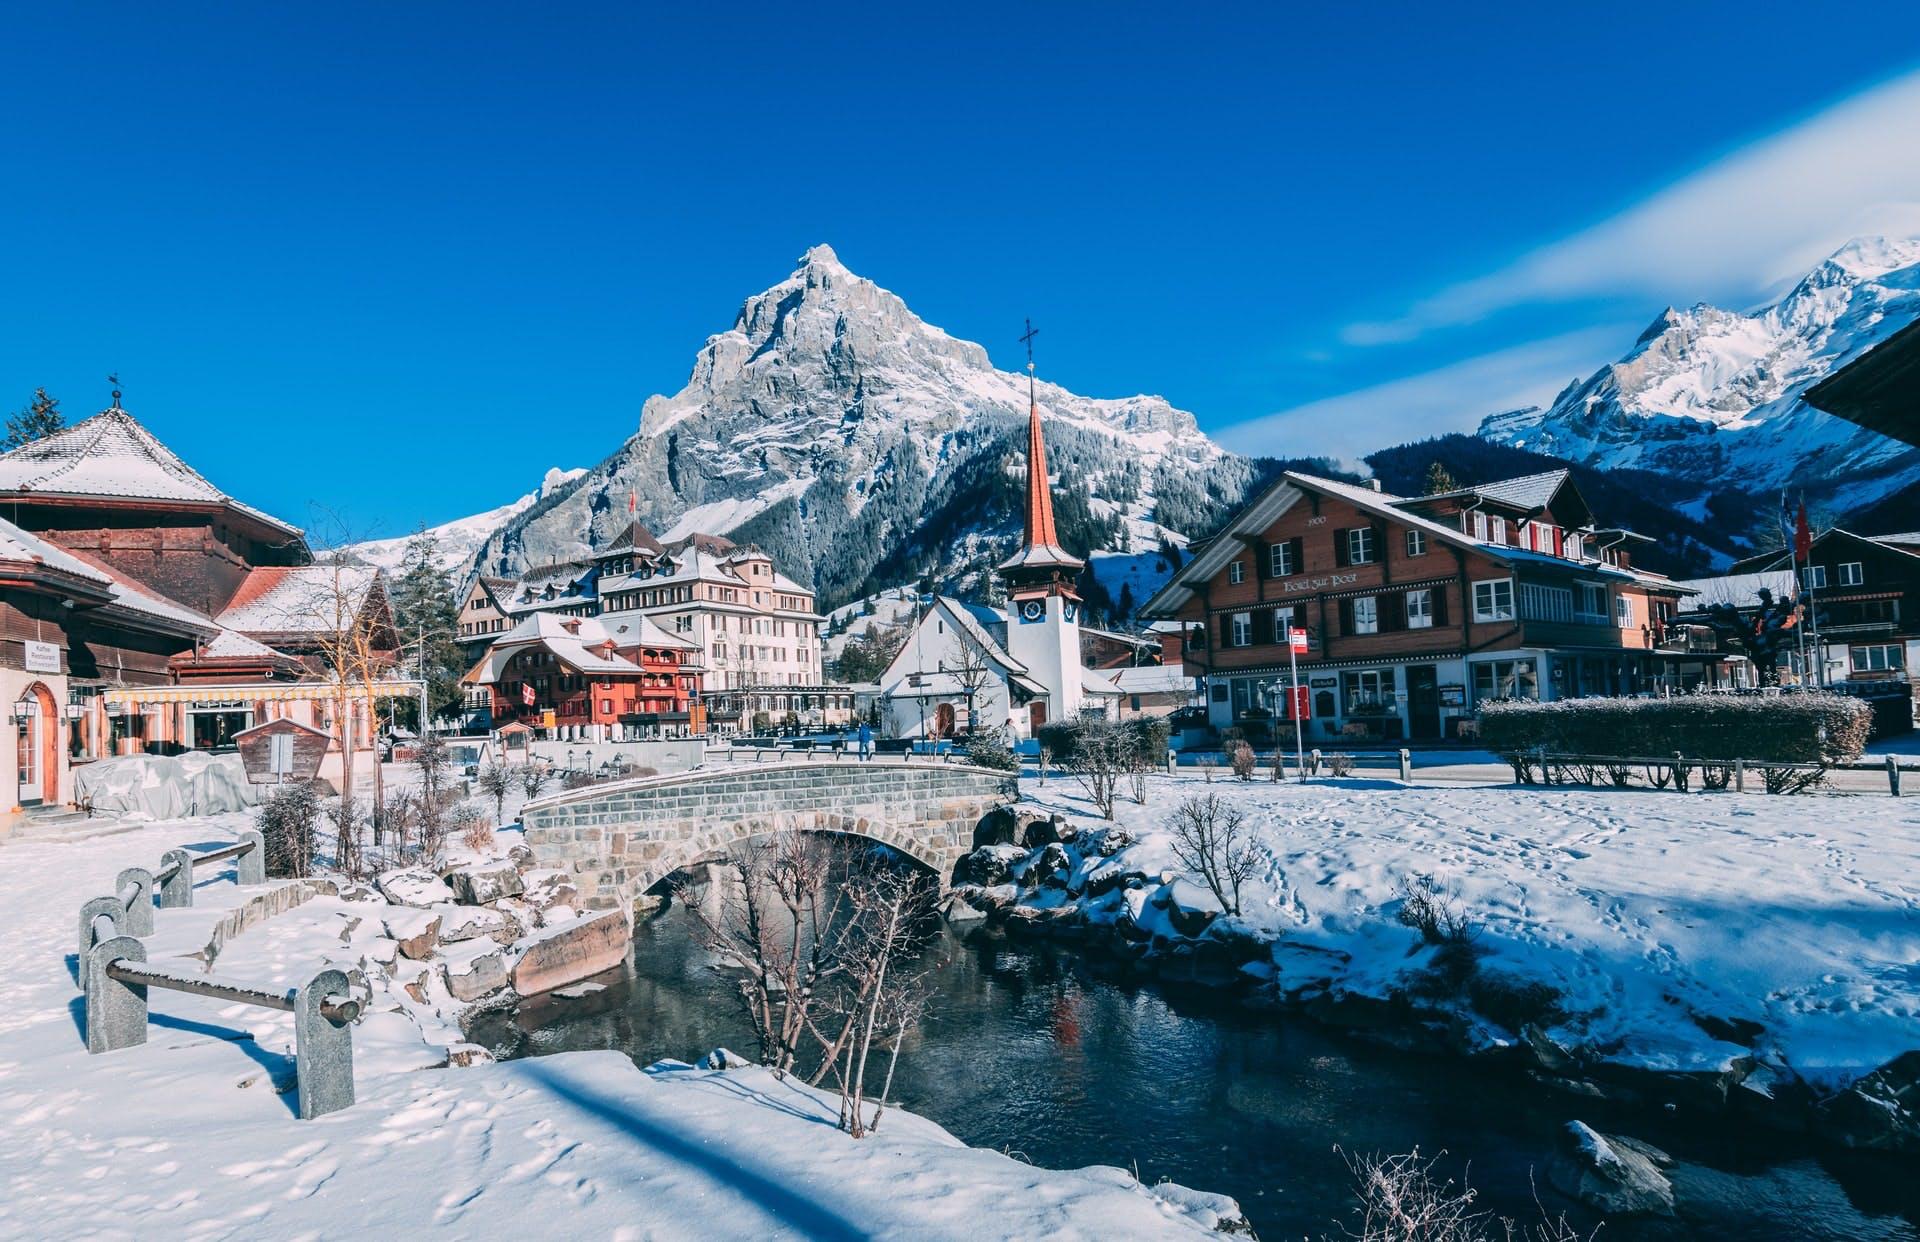 why ski or snowboard in switzerland